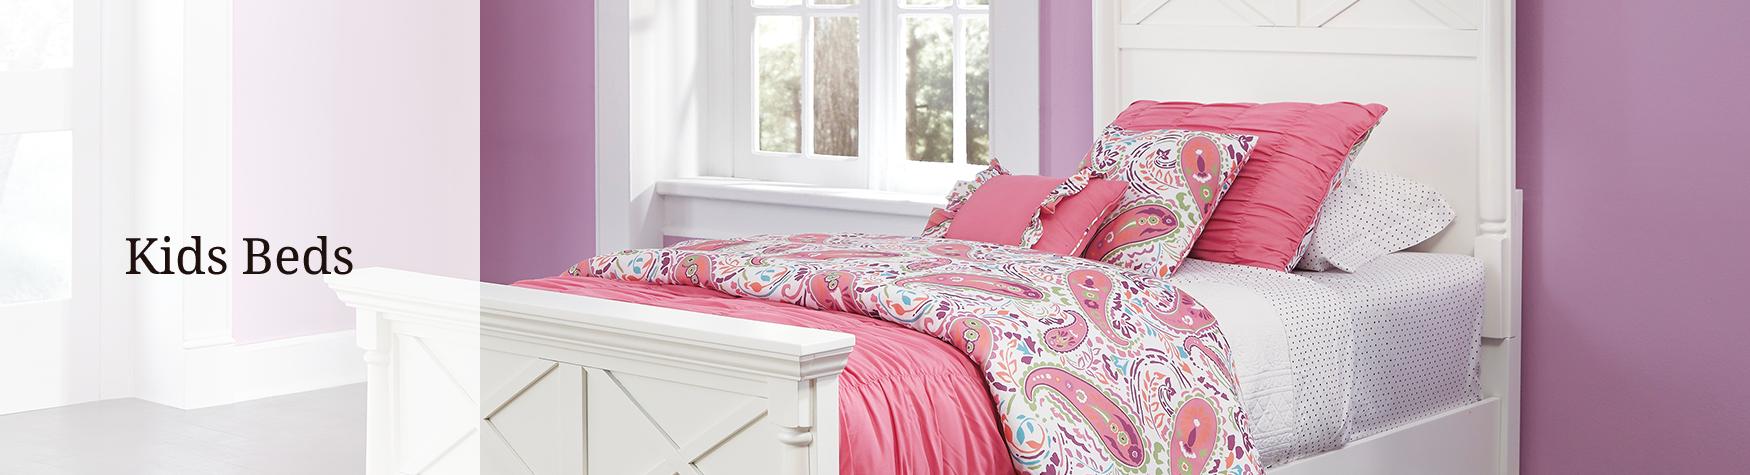 kids-beds-banner.png